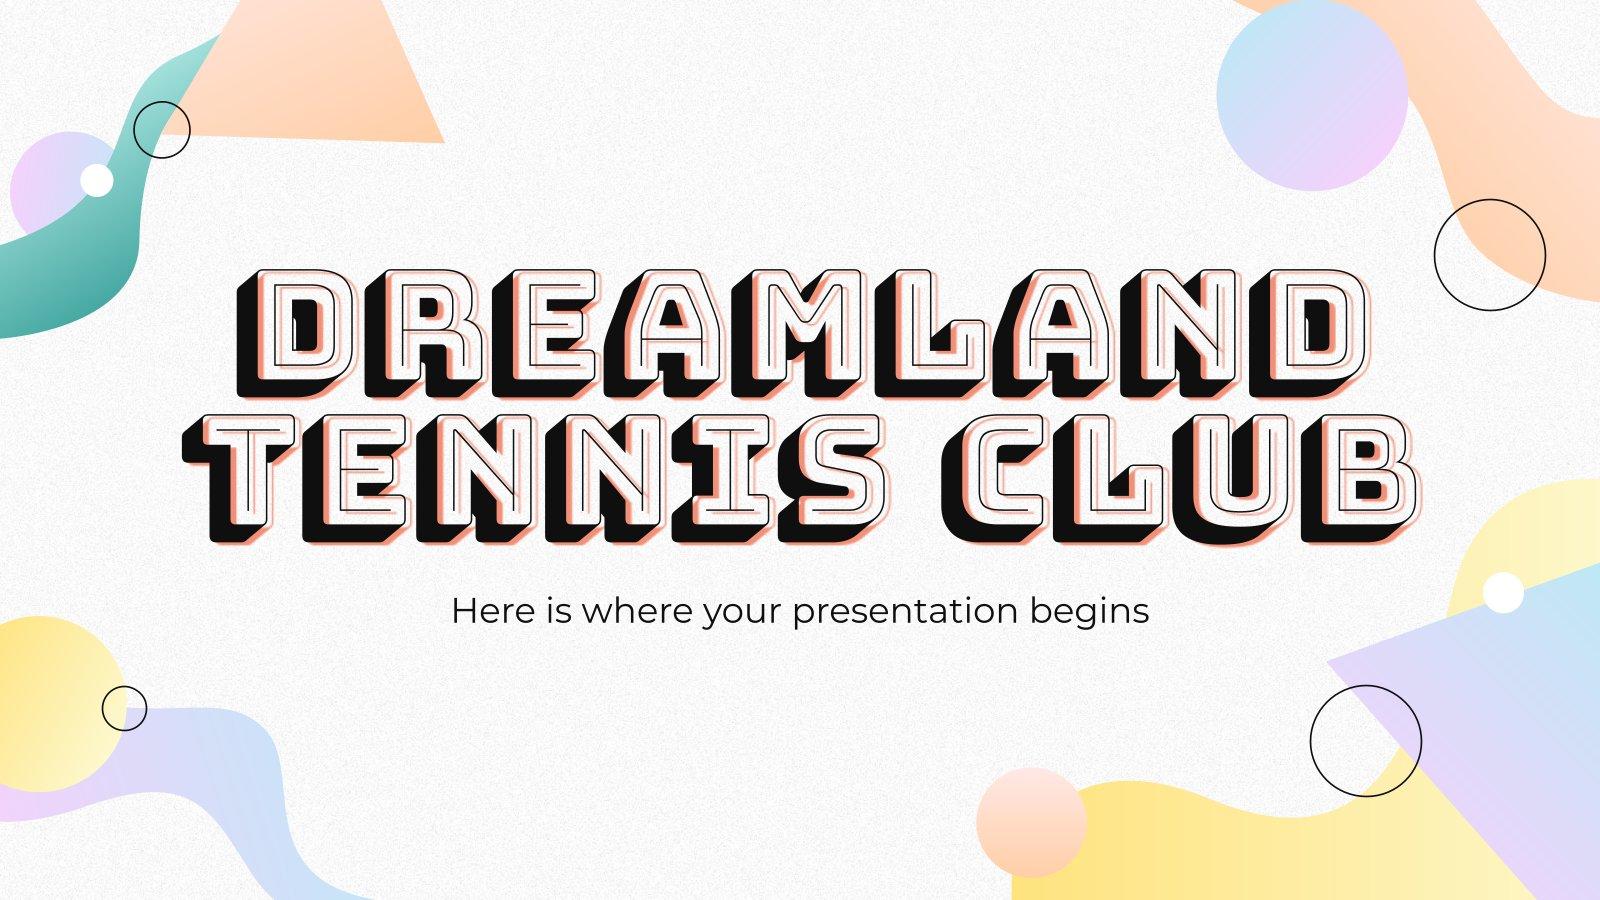 Dreamland Tennis Club presentation template